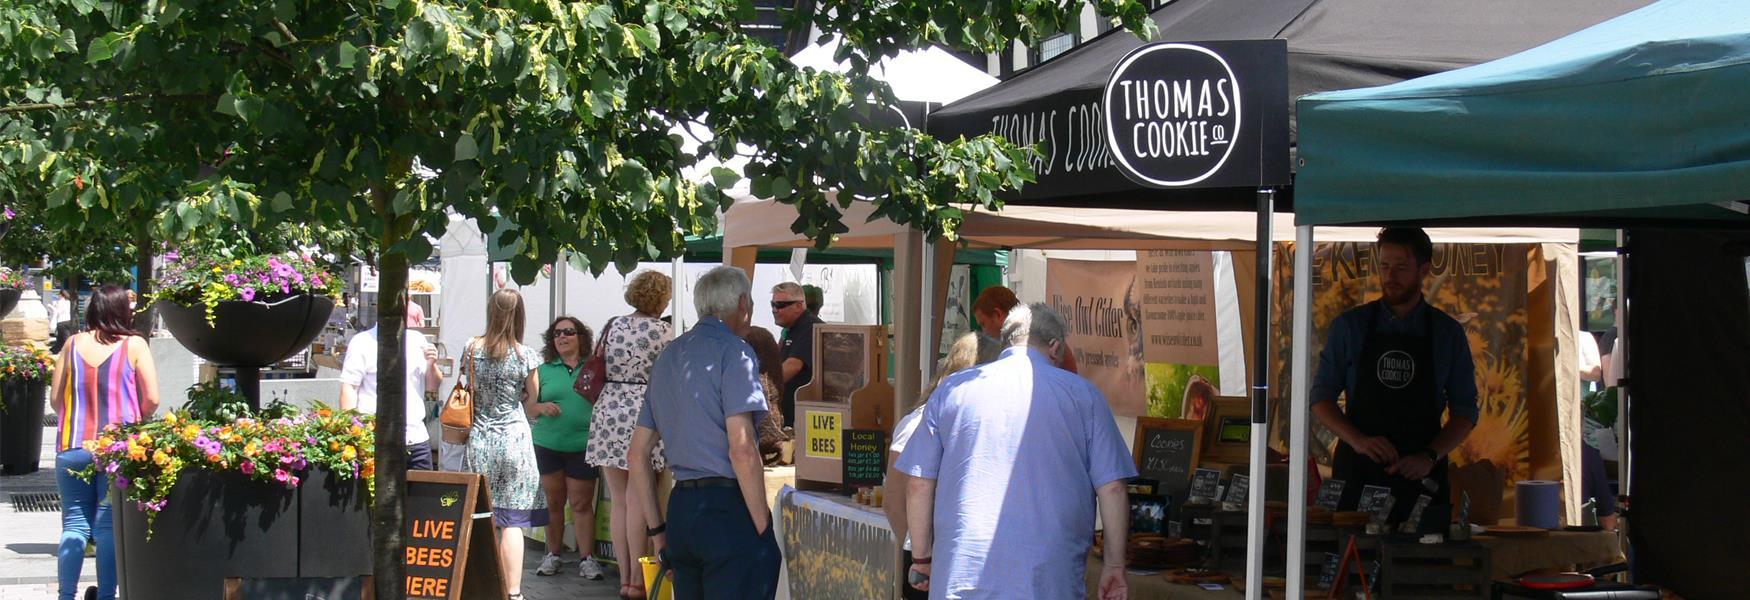 Maidstone Farmers Market